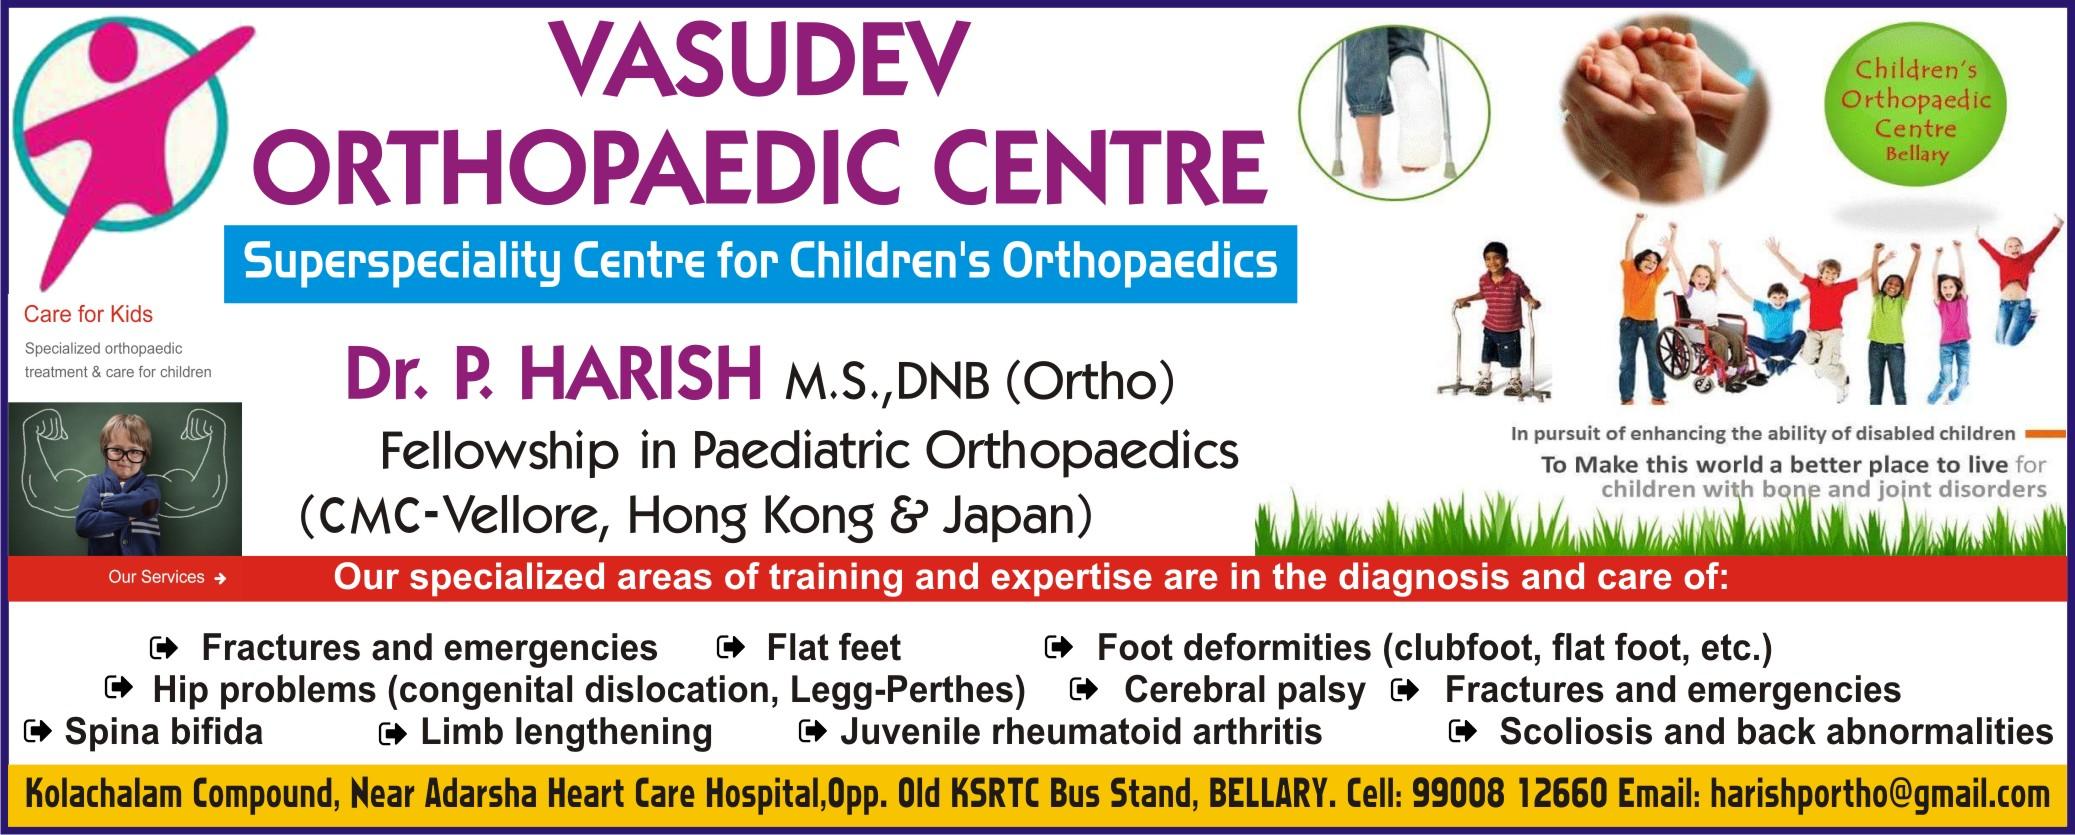 Dr. P. harish Vasudev Orthopaedic Centre